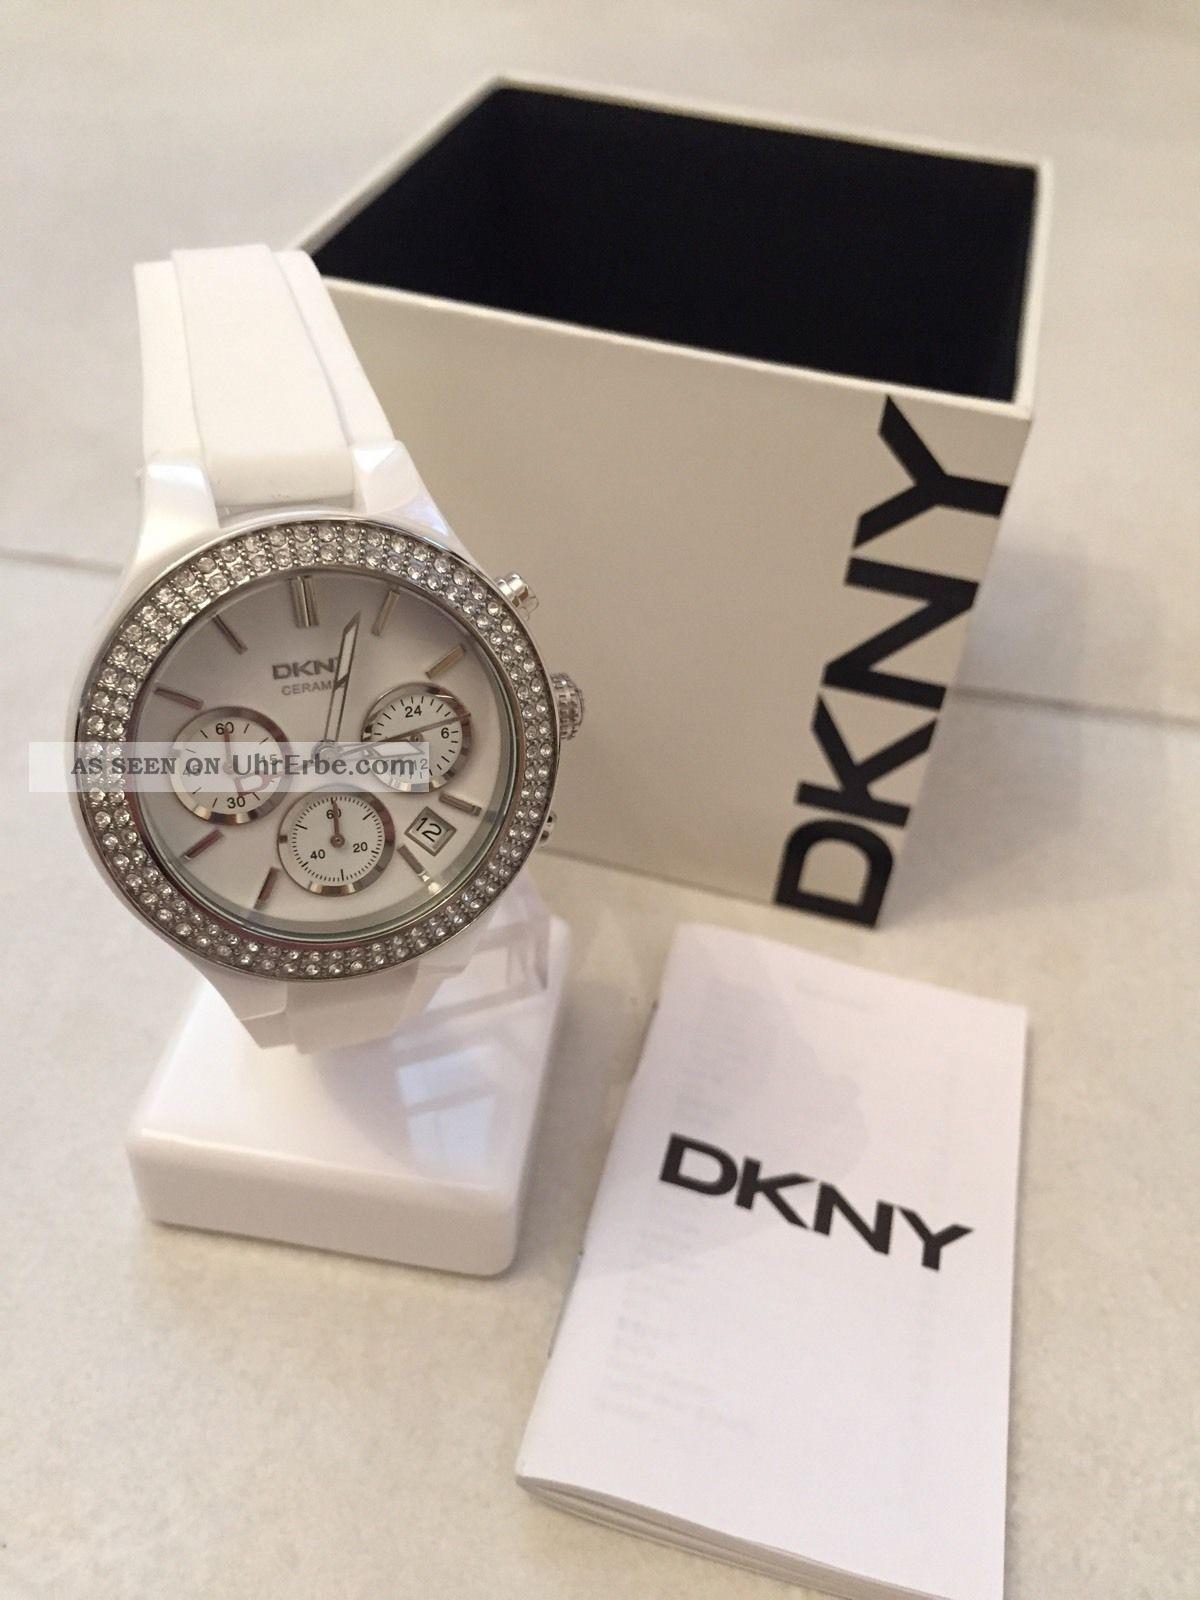 Dkny Donna Karan Ny8185 Damen - Uhr / Chronograph Keramik / Weiss Armbanduhren Bild